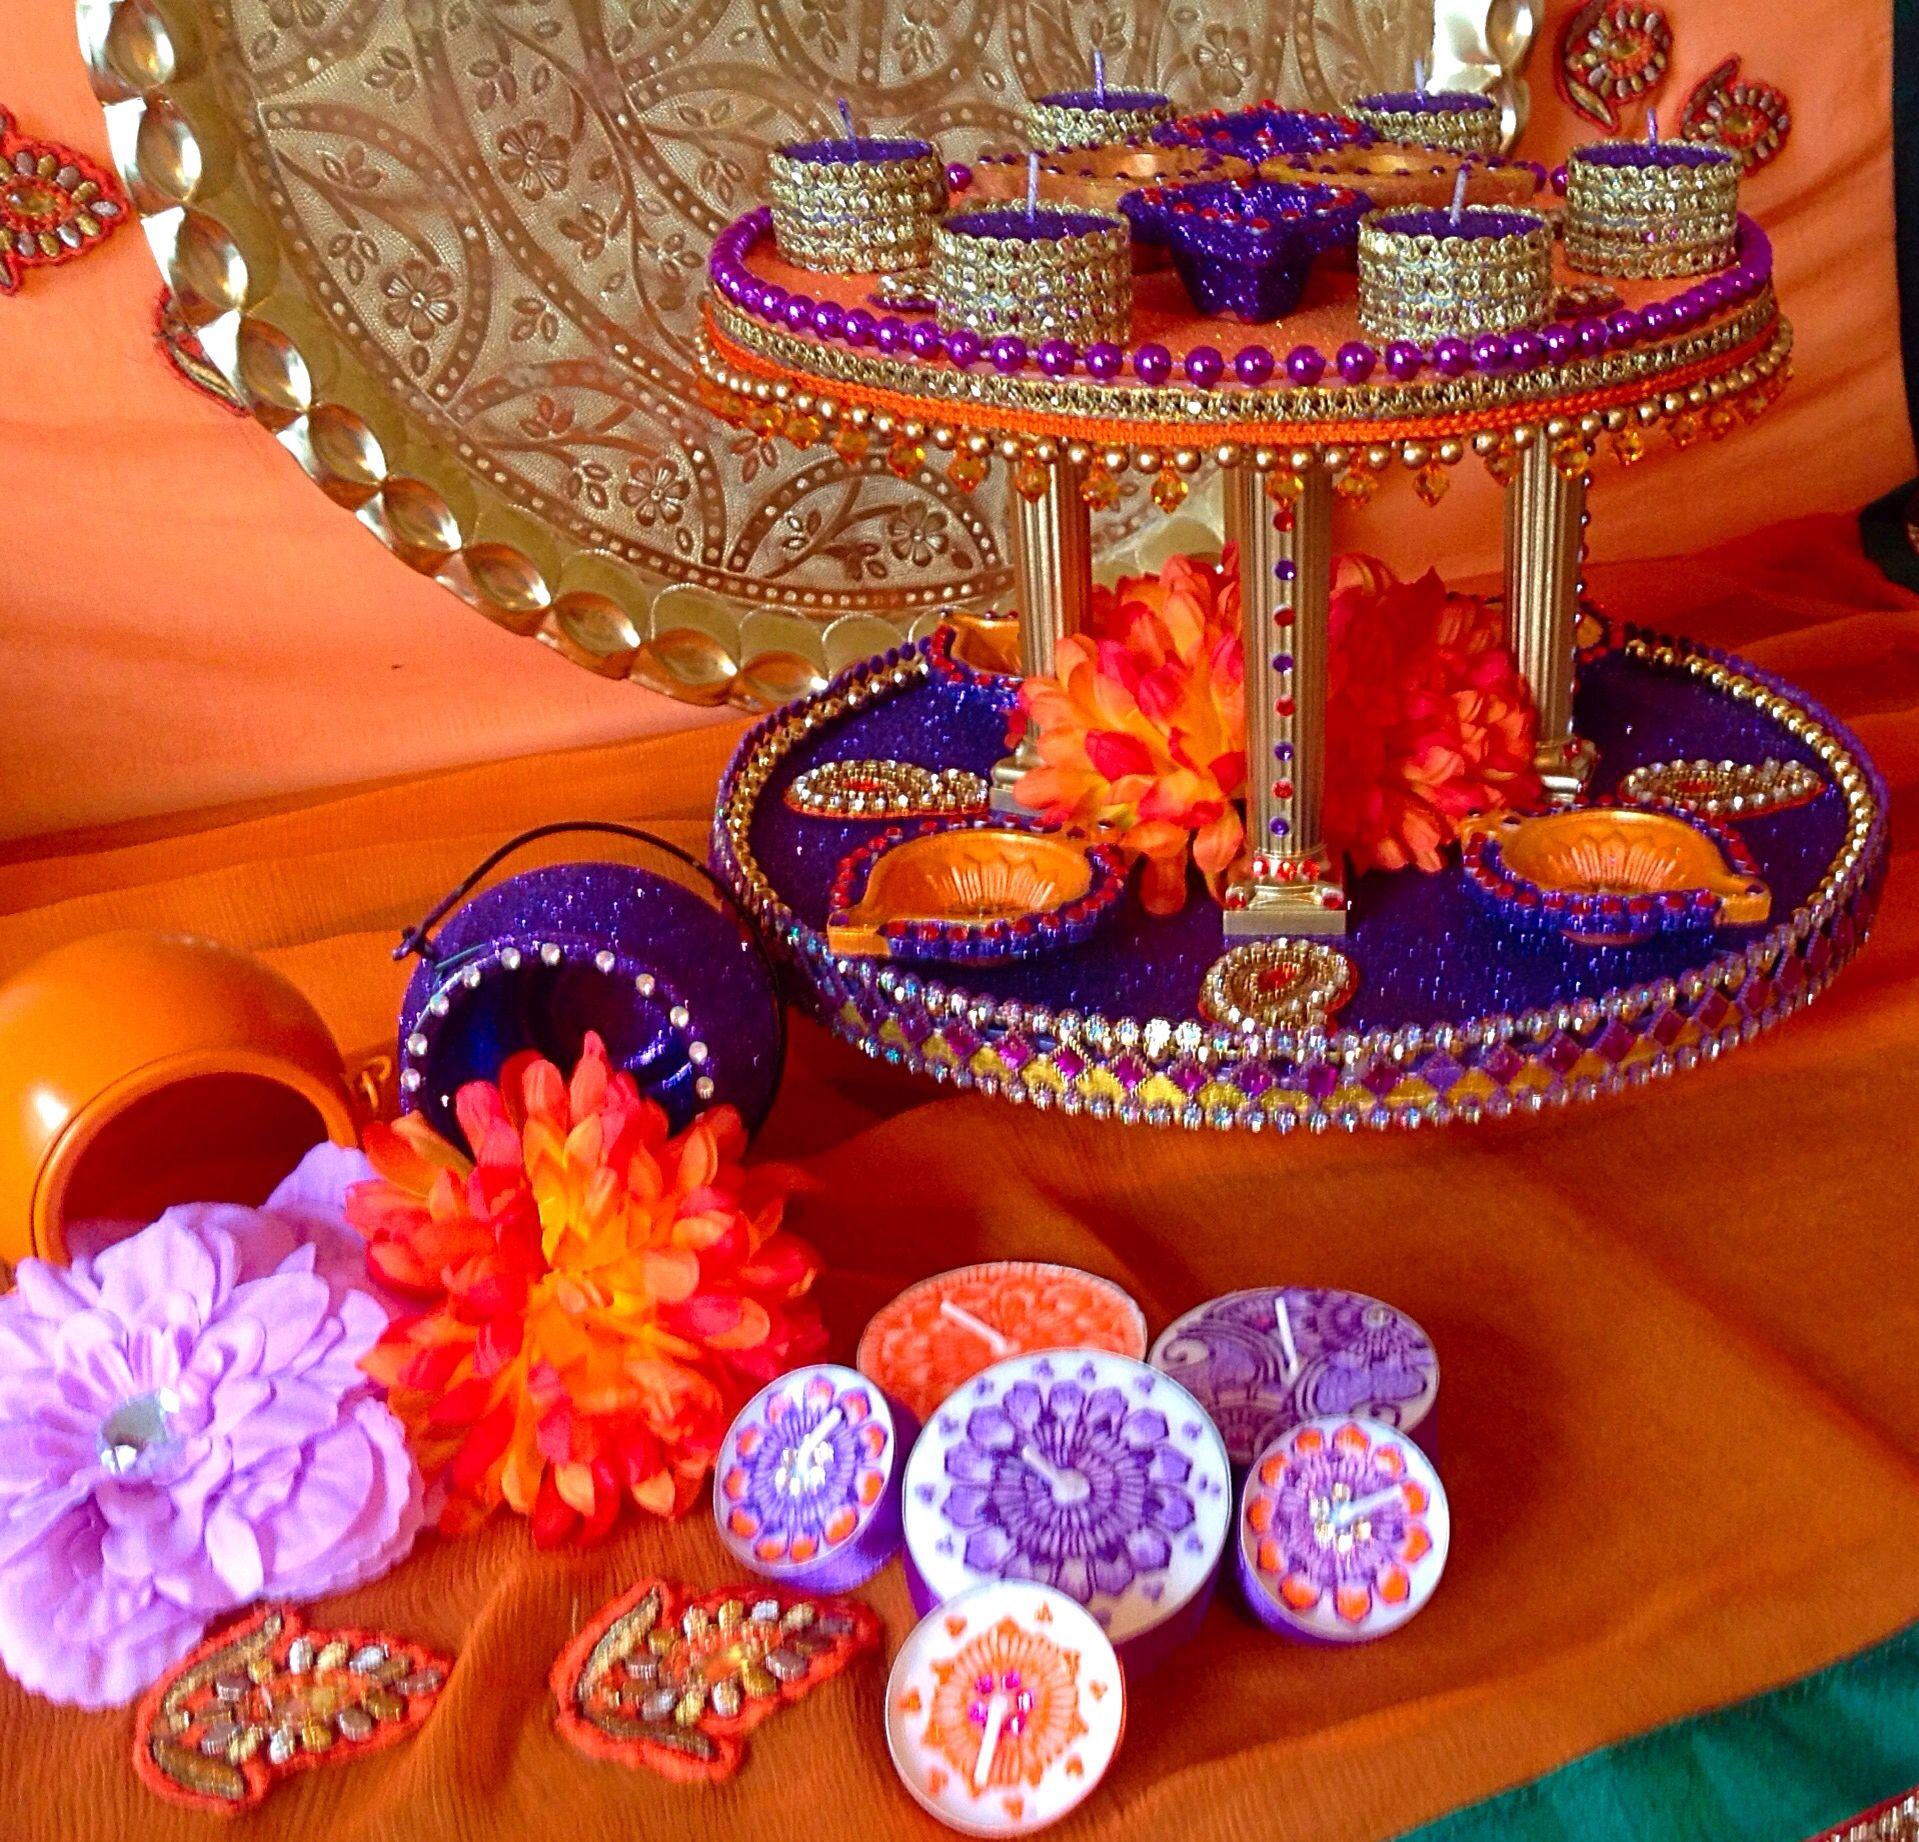 Mehndi Plates Decoration Ideas 2018 : Beautiful double tiered mehndi plate vibrant orange and